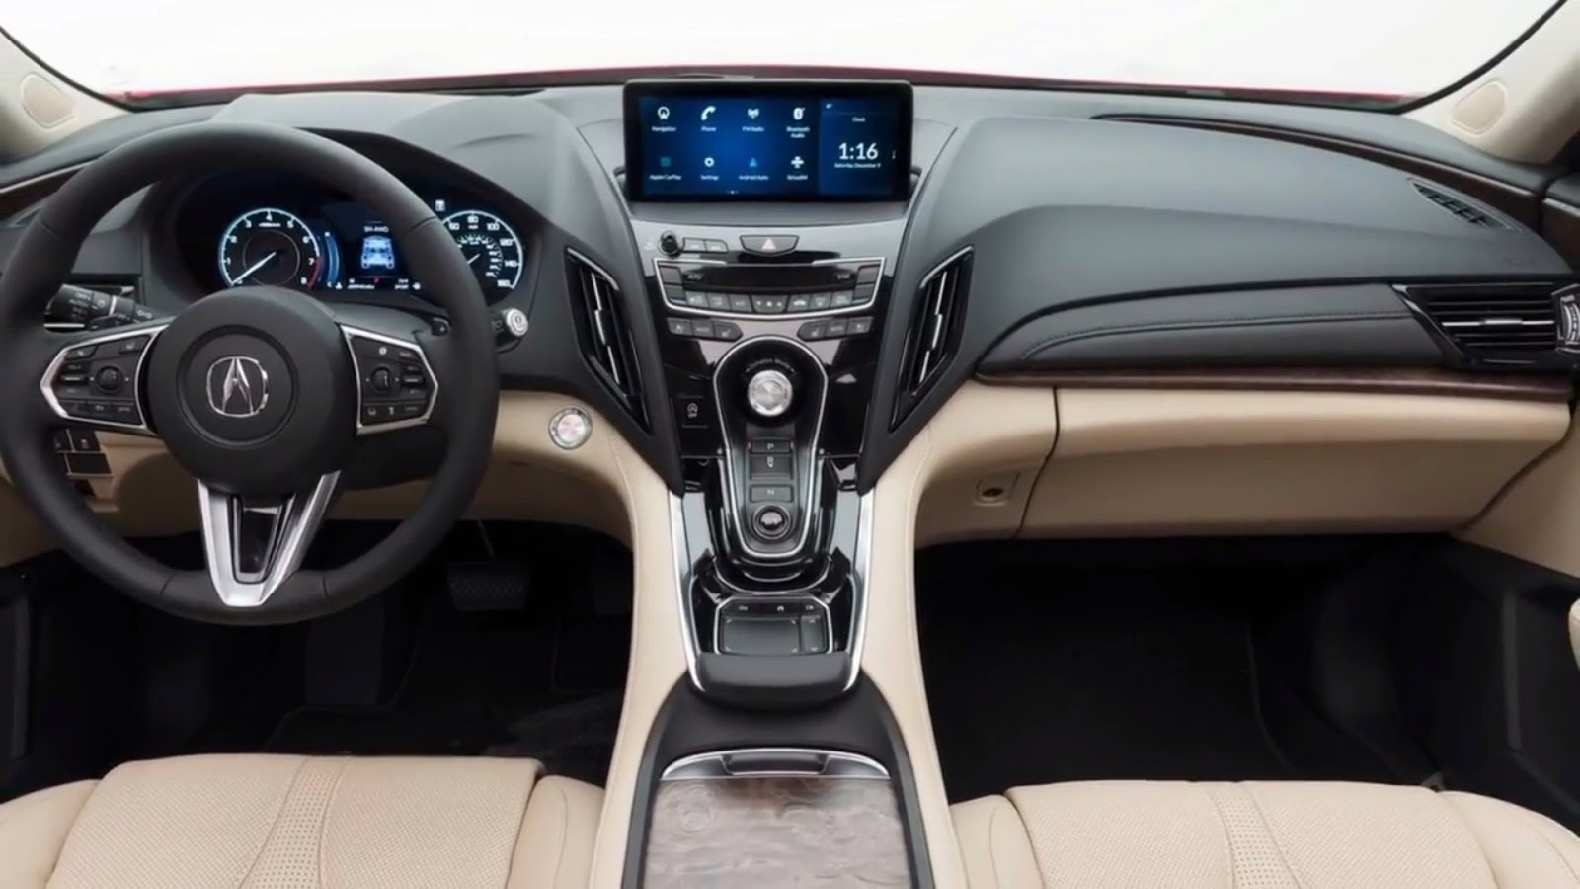 60 The 2019 Acura Rdx Rumors Overview with 2019 Acura Rdx Rumors